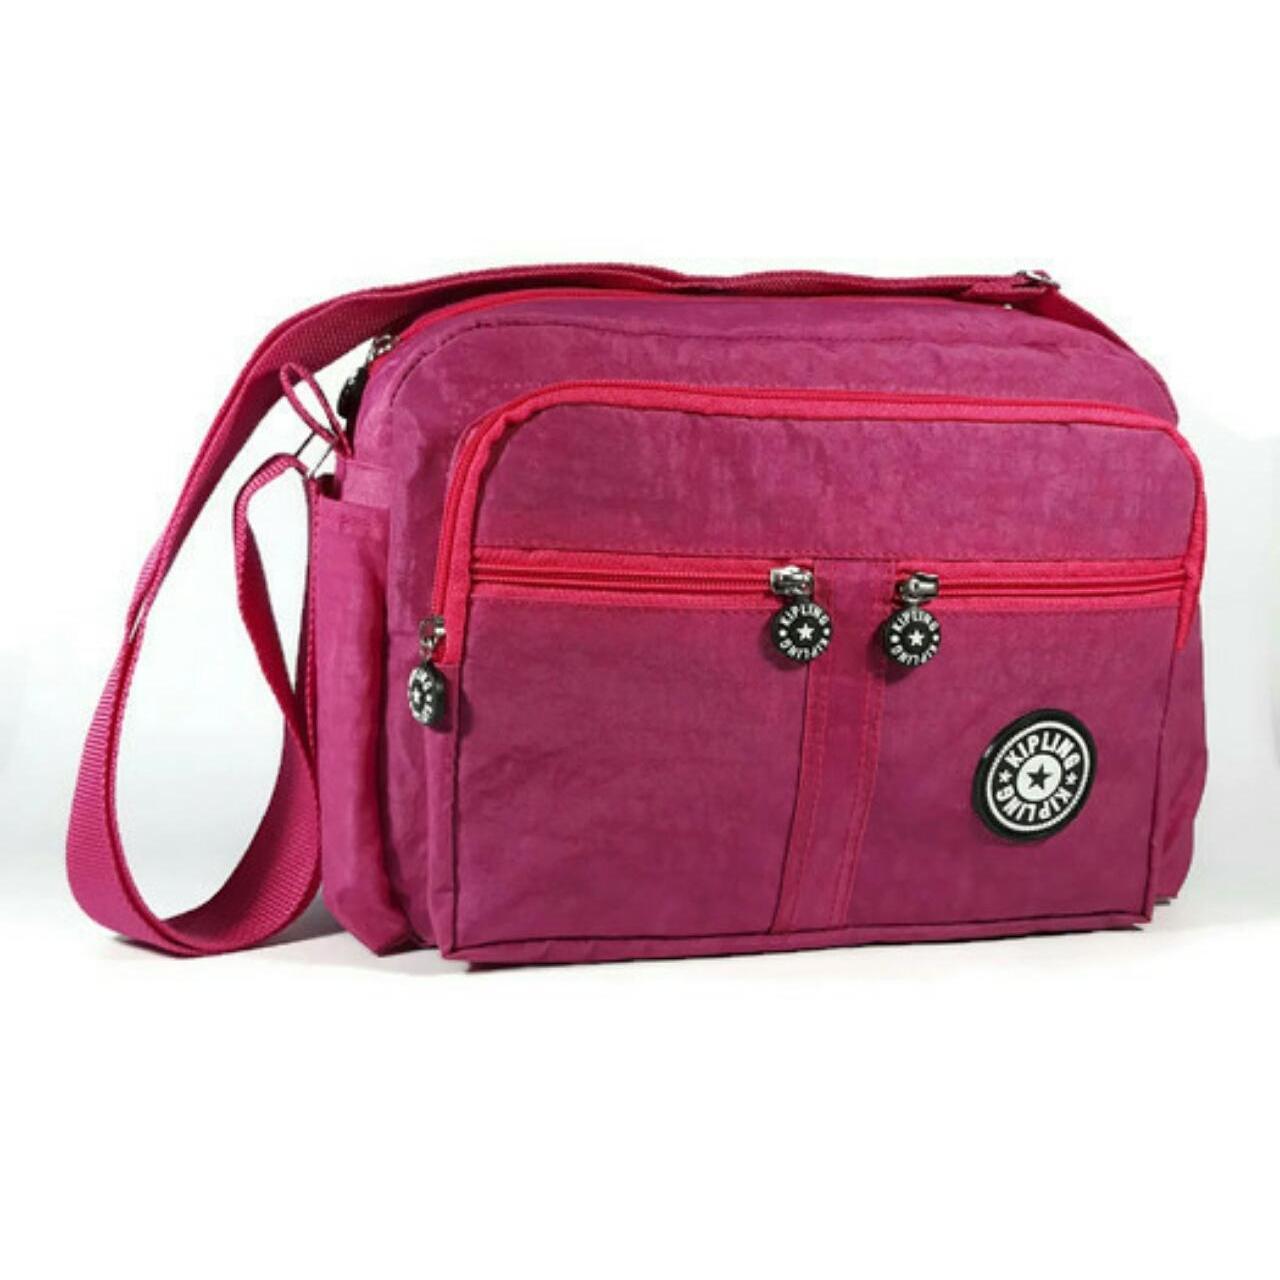 Tas Slempang Wanita Sling Bag Fashion Wanita Tas Branded Casual 001